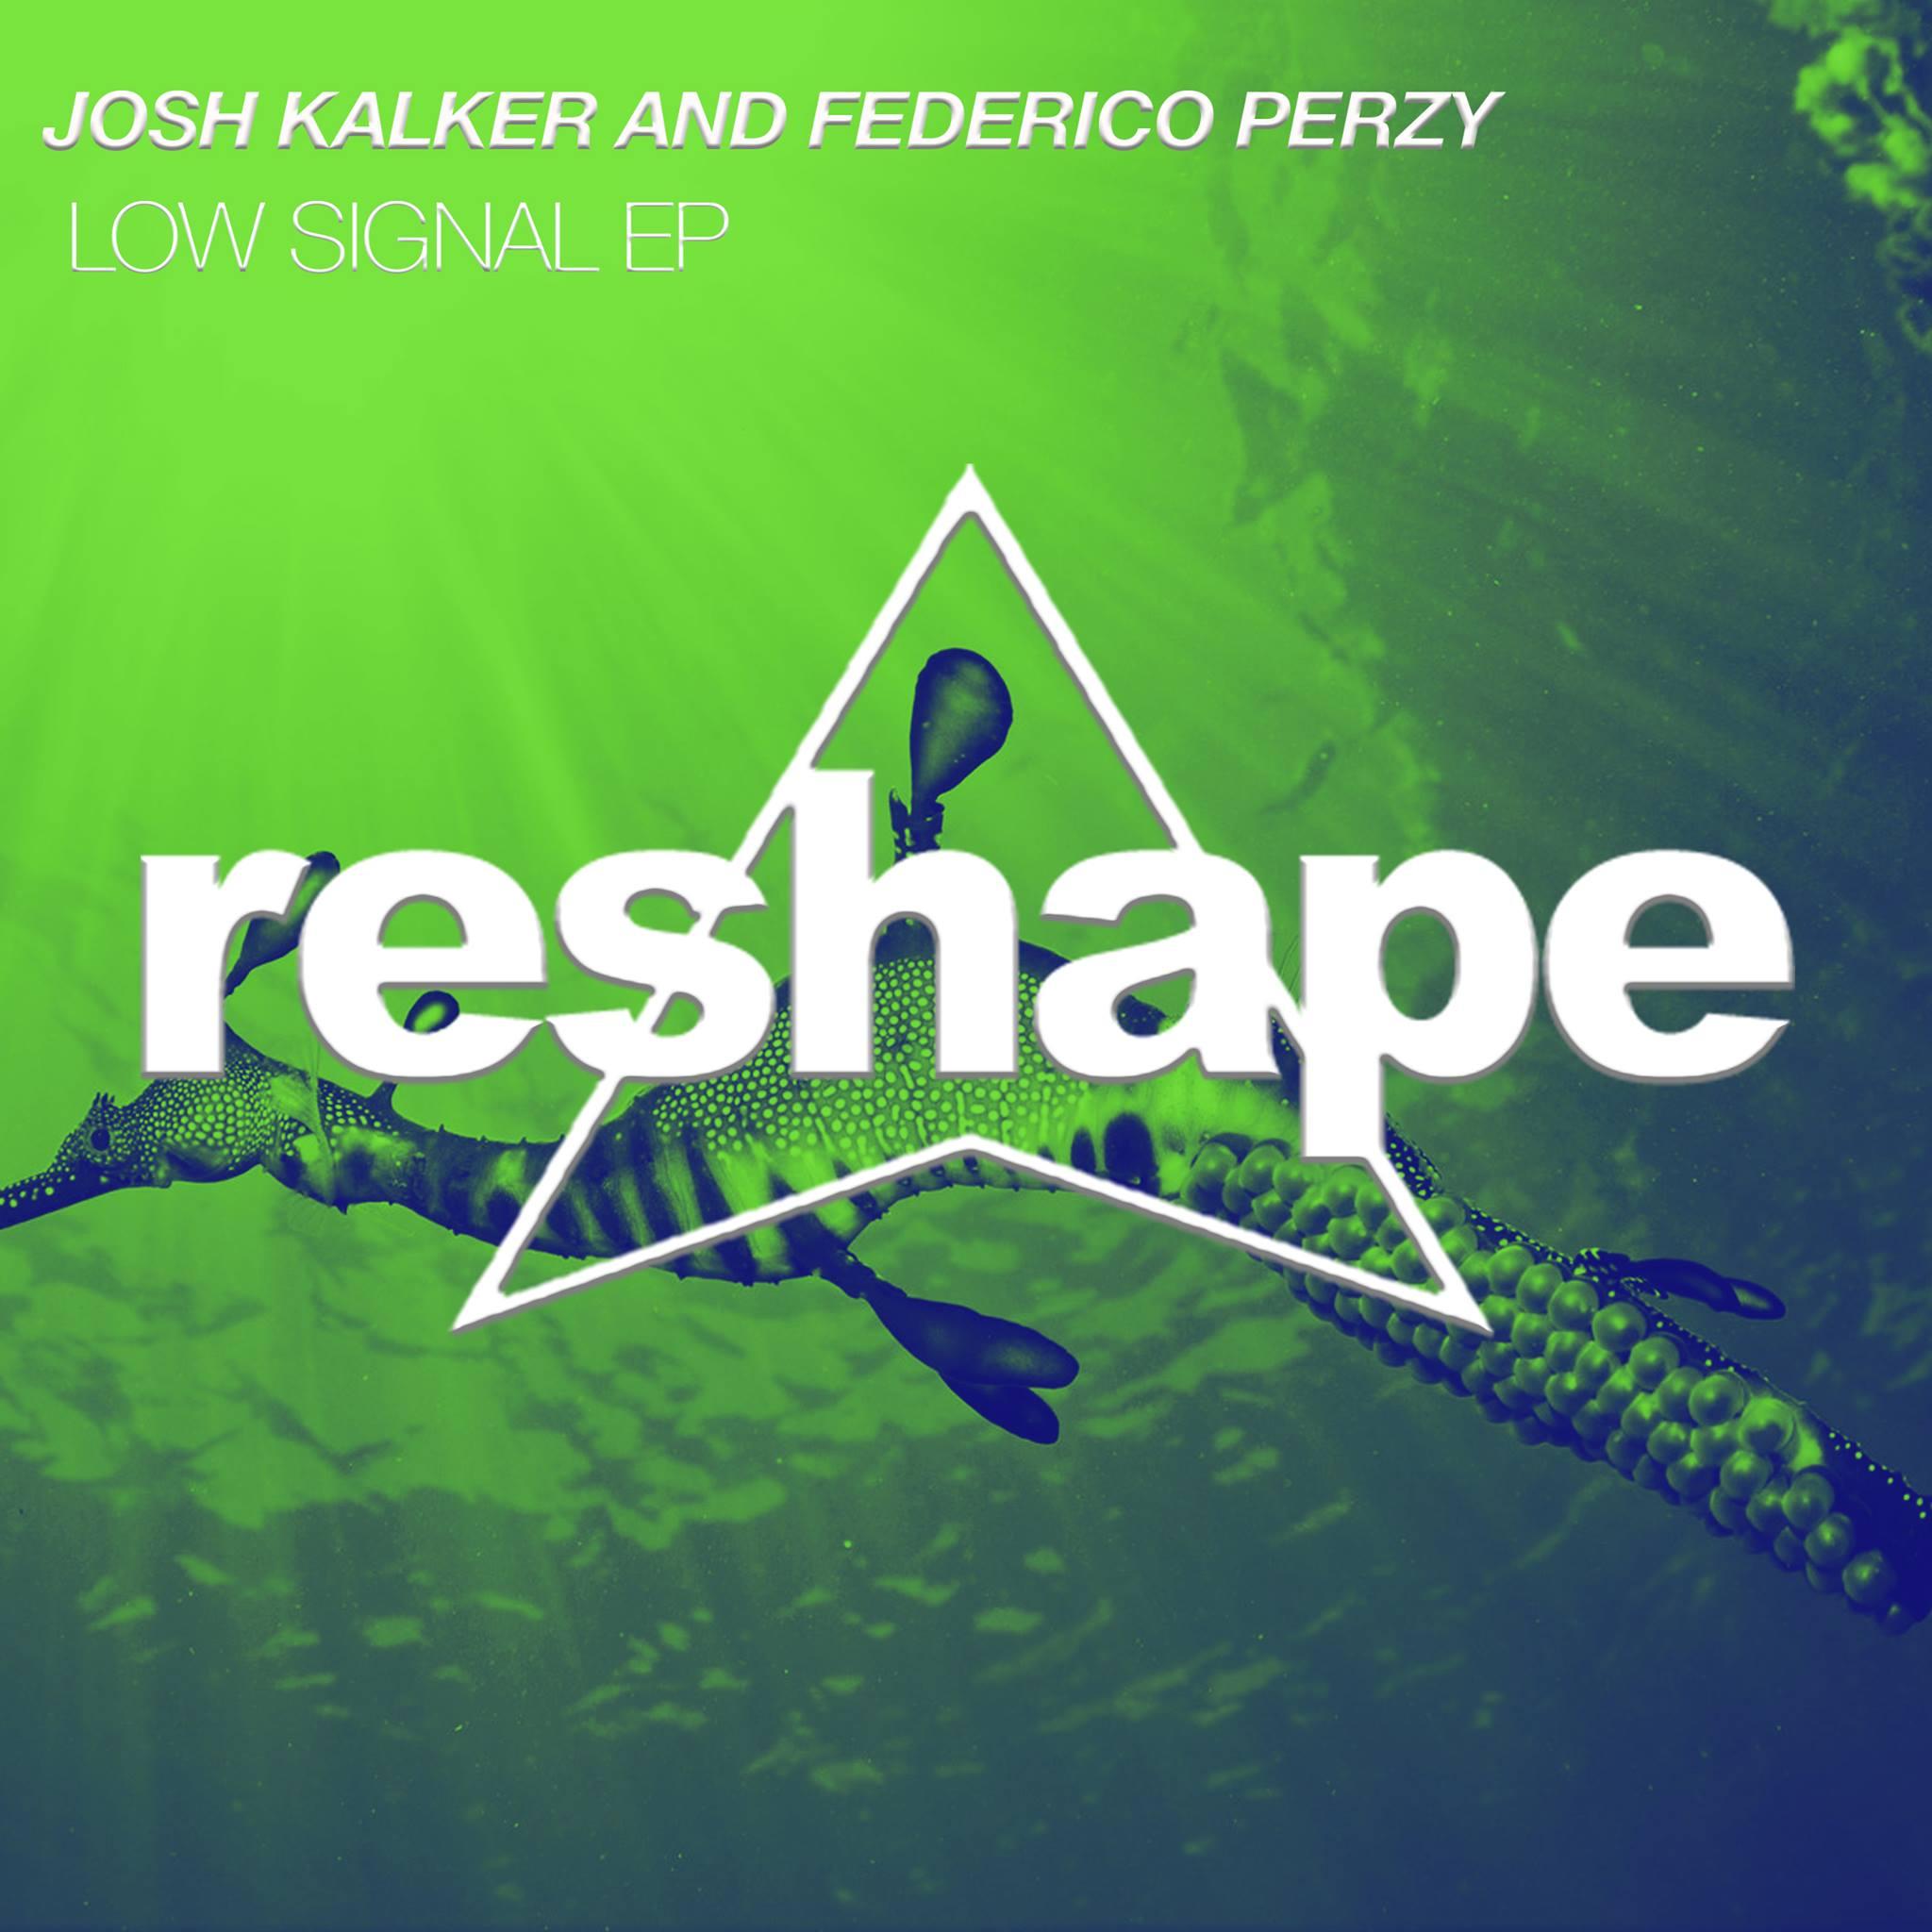 Josh Kalker & Federico Perzy - Destination (Original Version)